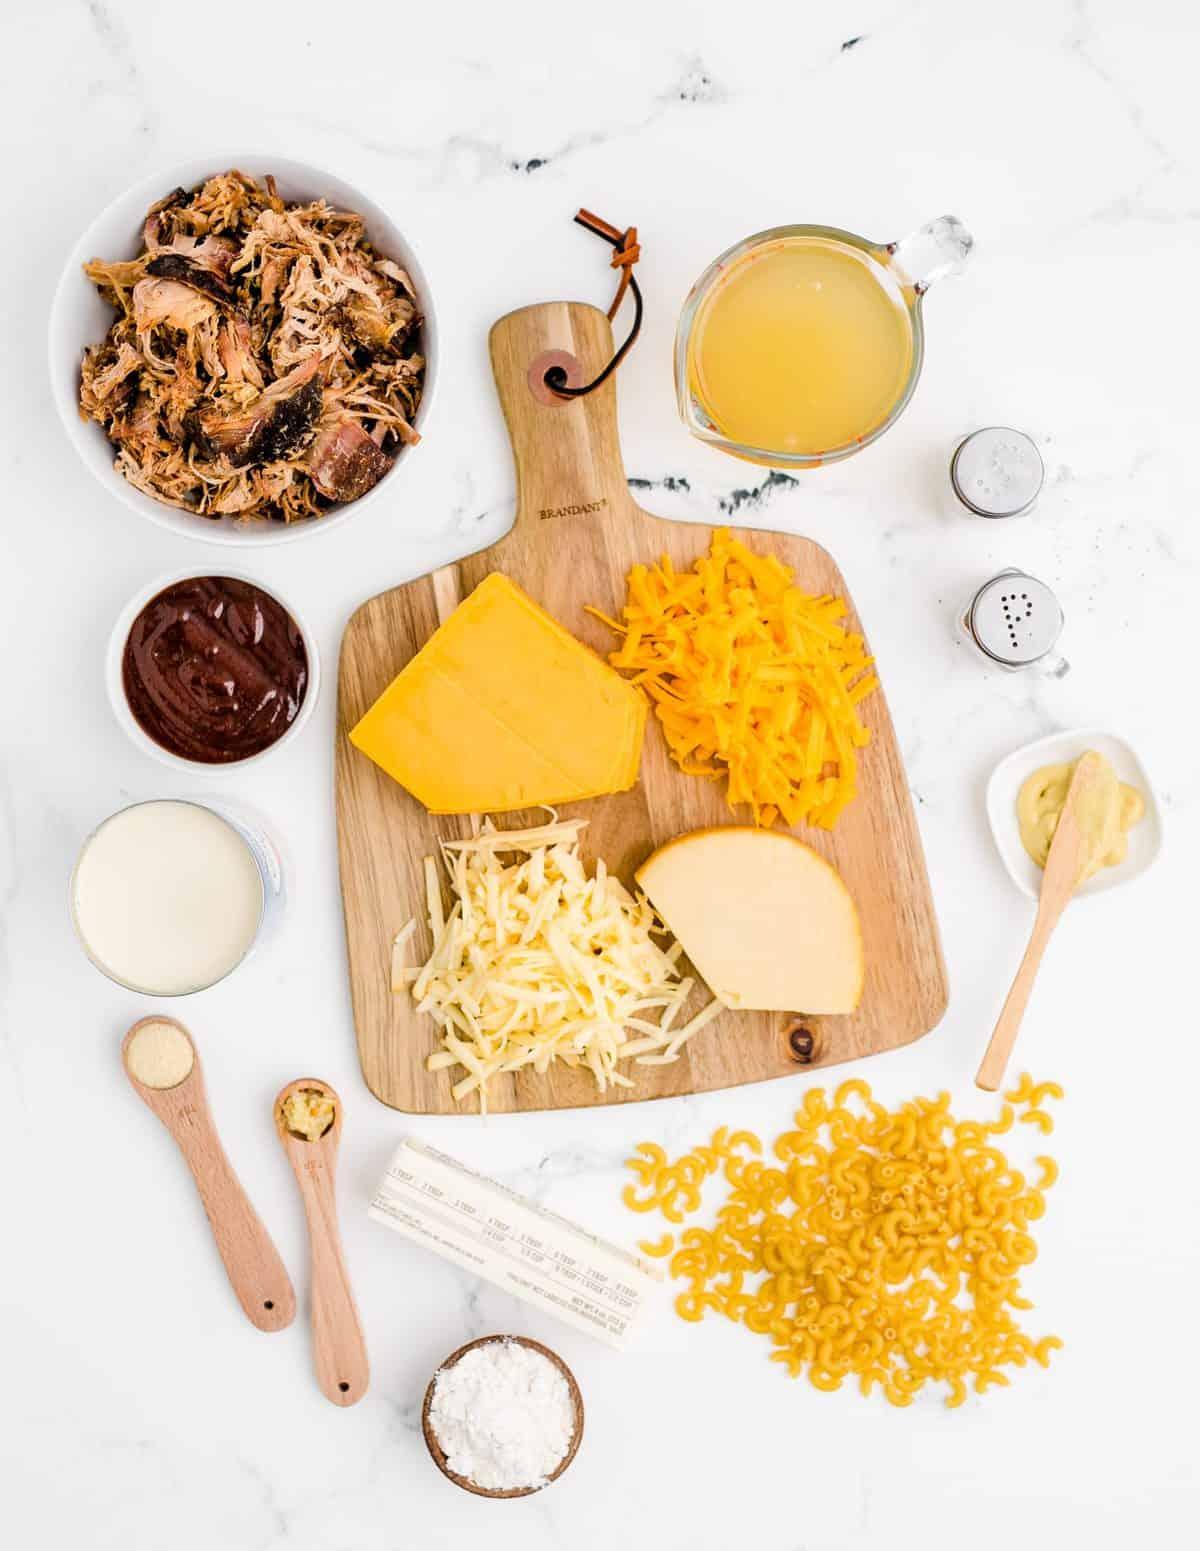 Ingredients needed: macaroni, salted butter, all-purpose flour, evaporated milk, chicken broth, salt, pepper, dijon mustard, onion powder, garlic, cheddar cheese, gouda cheese, pulled pork and BBQ sauce.